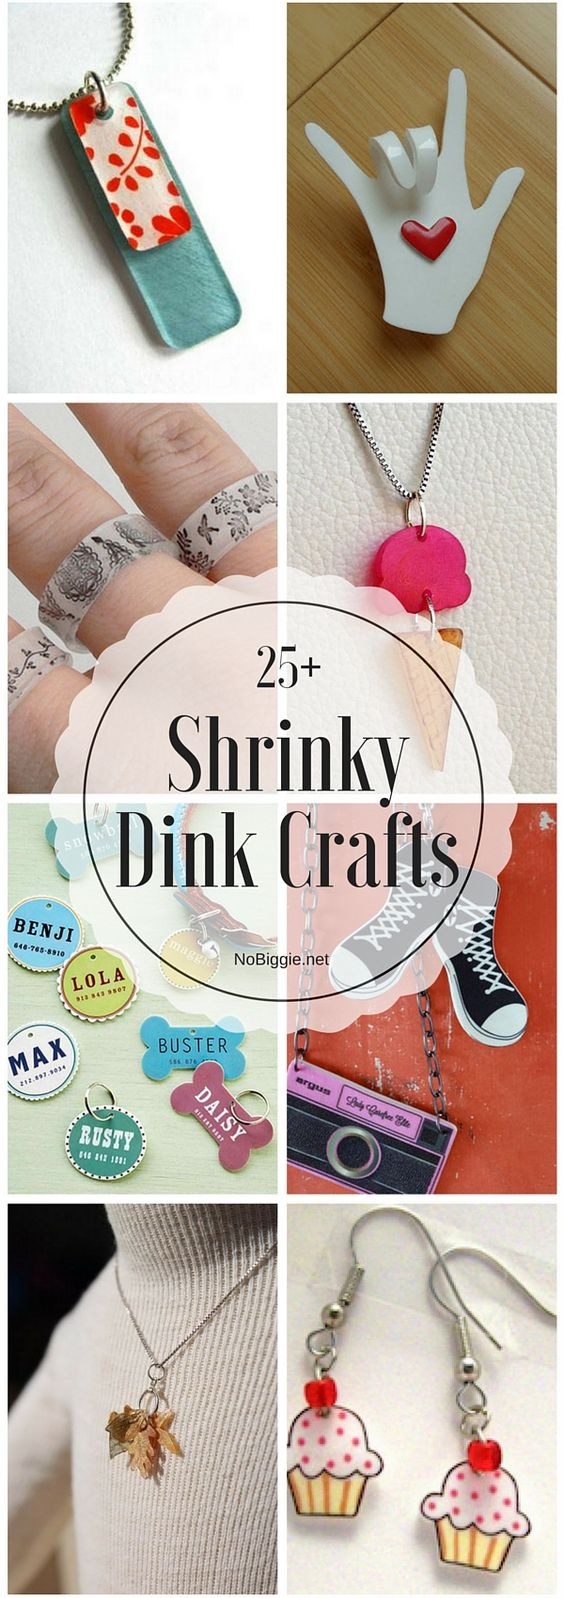 25+ Shrinky Dink Crafts   NoBiggie.net